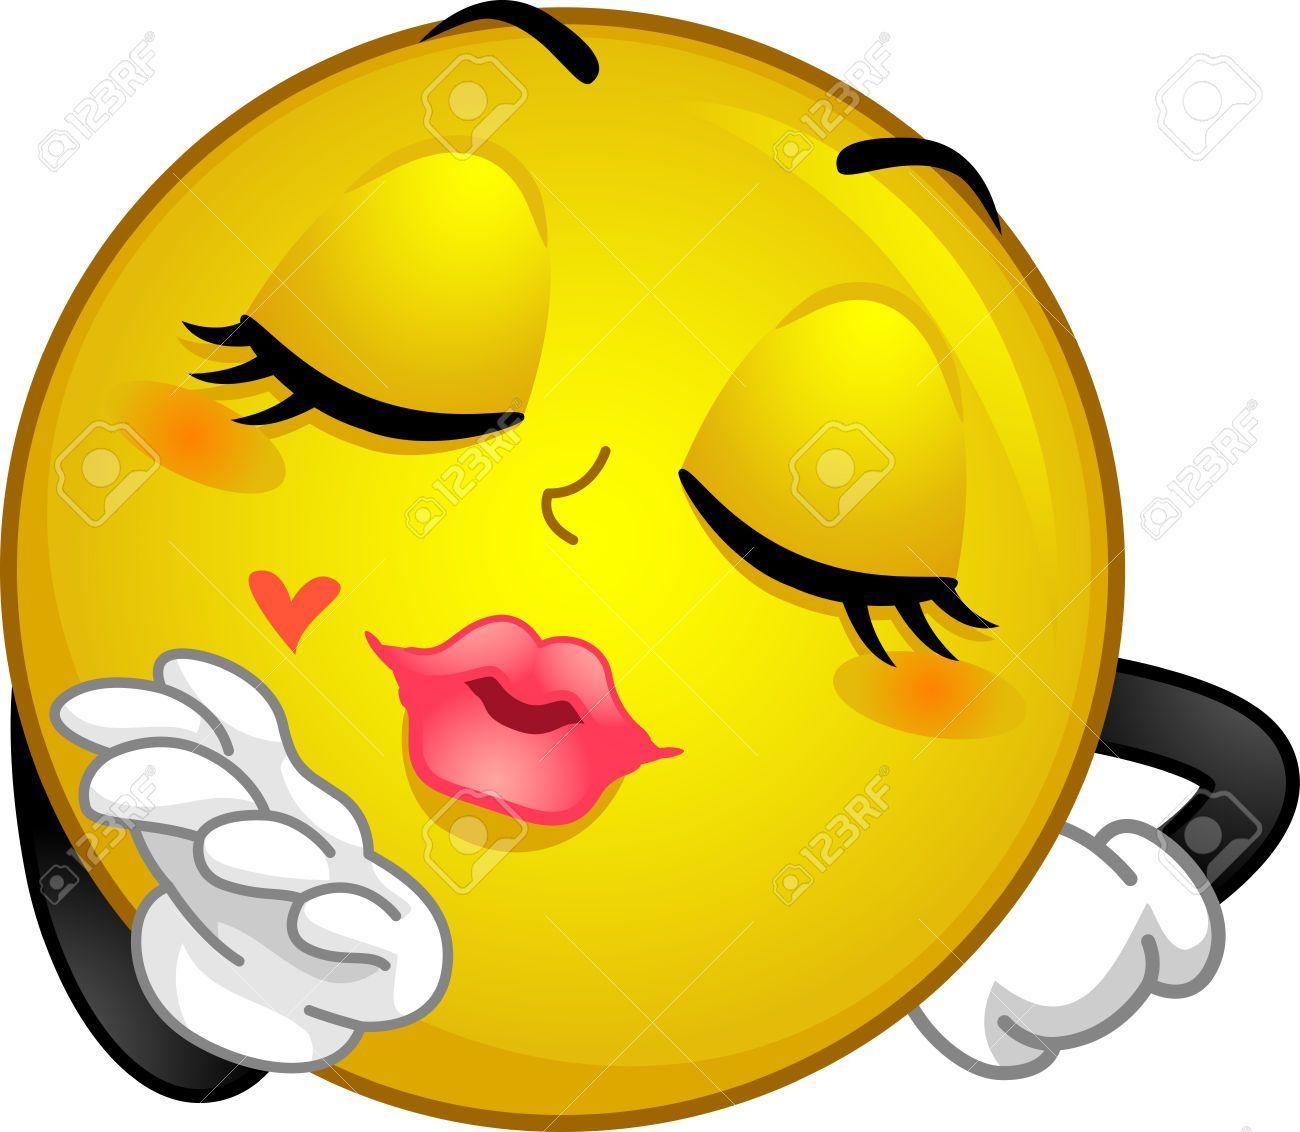 Thumbs Up Meme Emoji